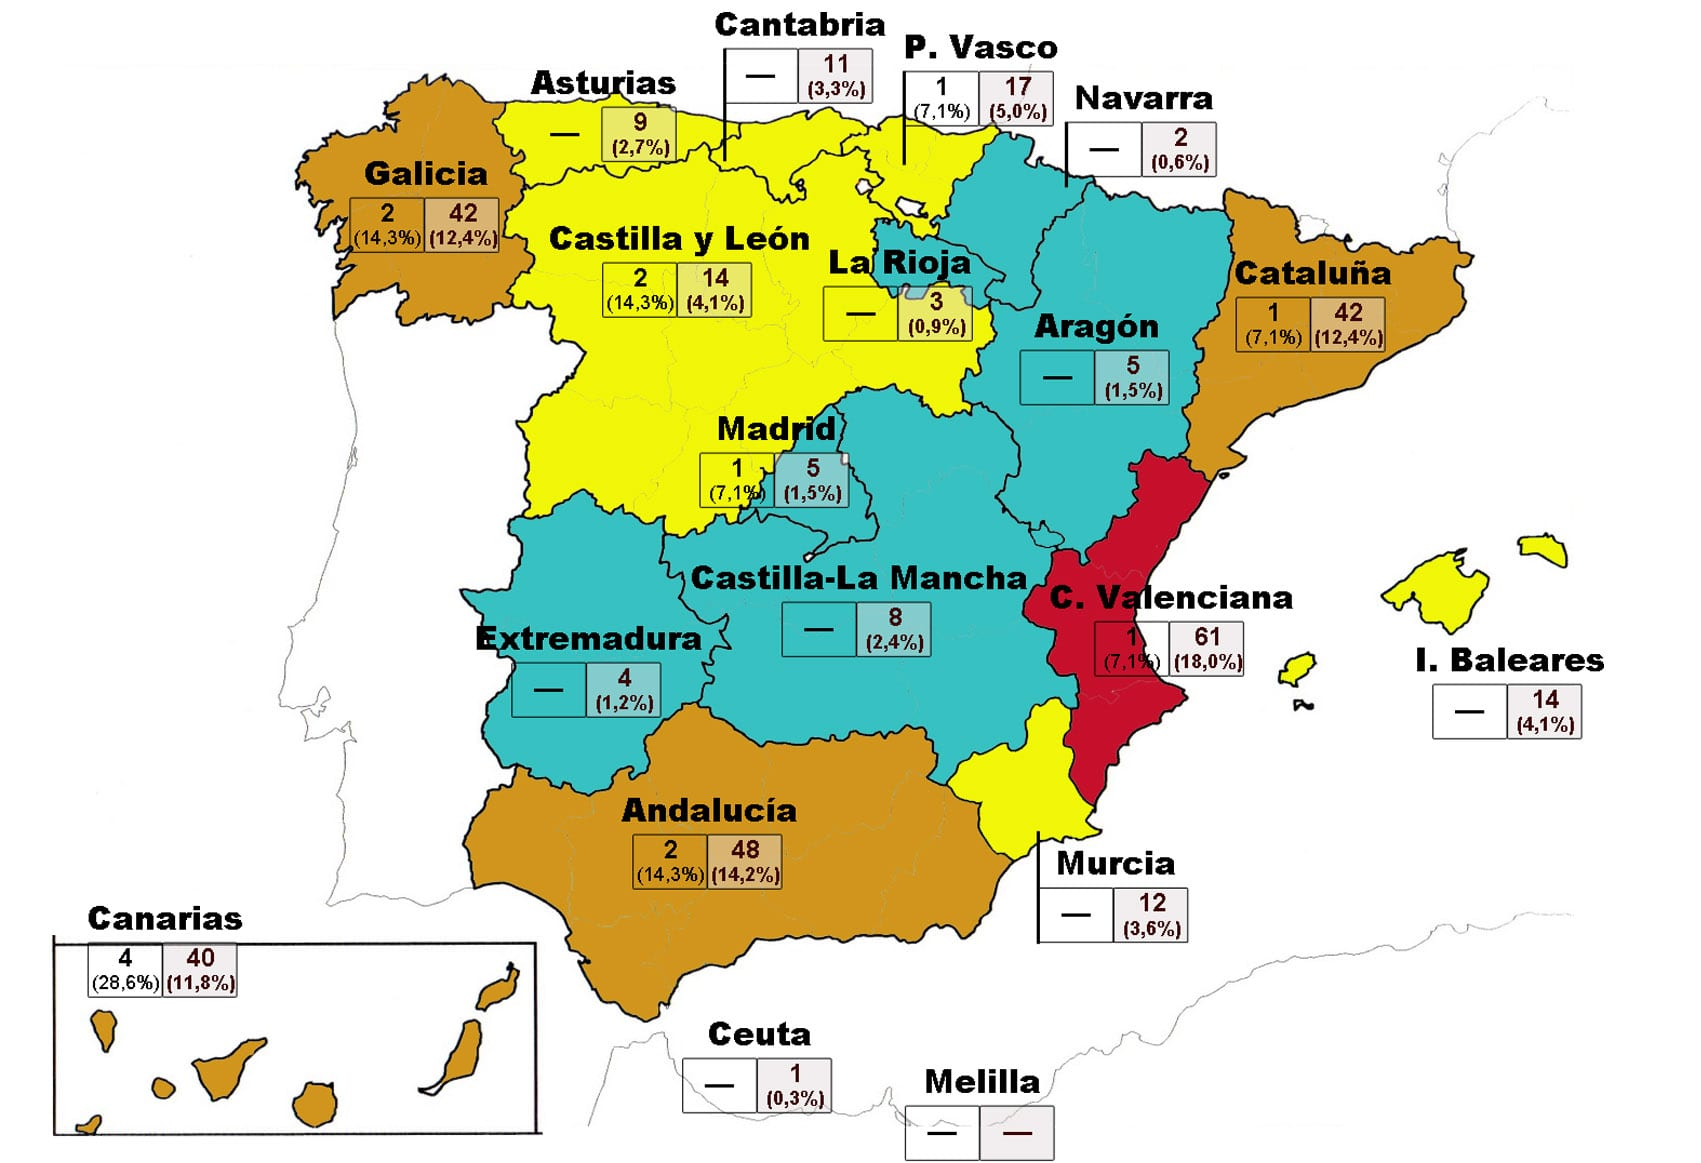 2020 afgesloten met 338 verdrinkingsdoden in Spanje